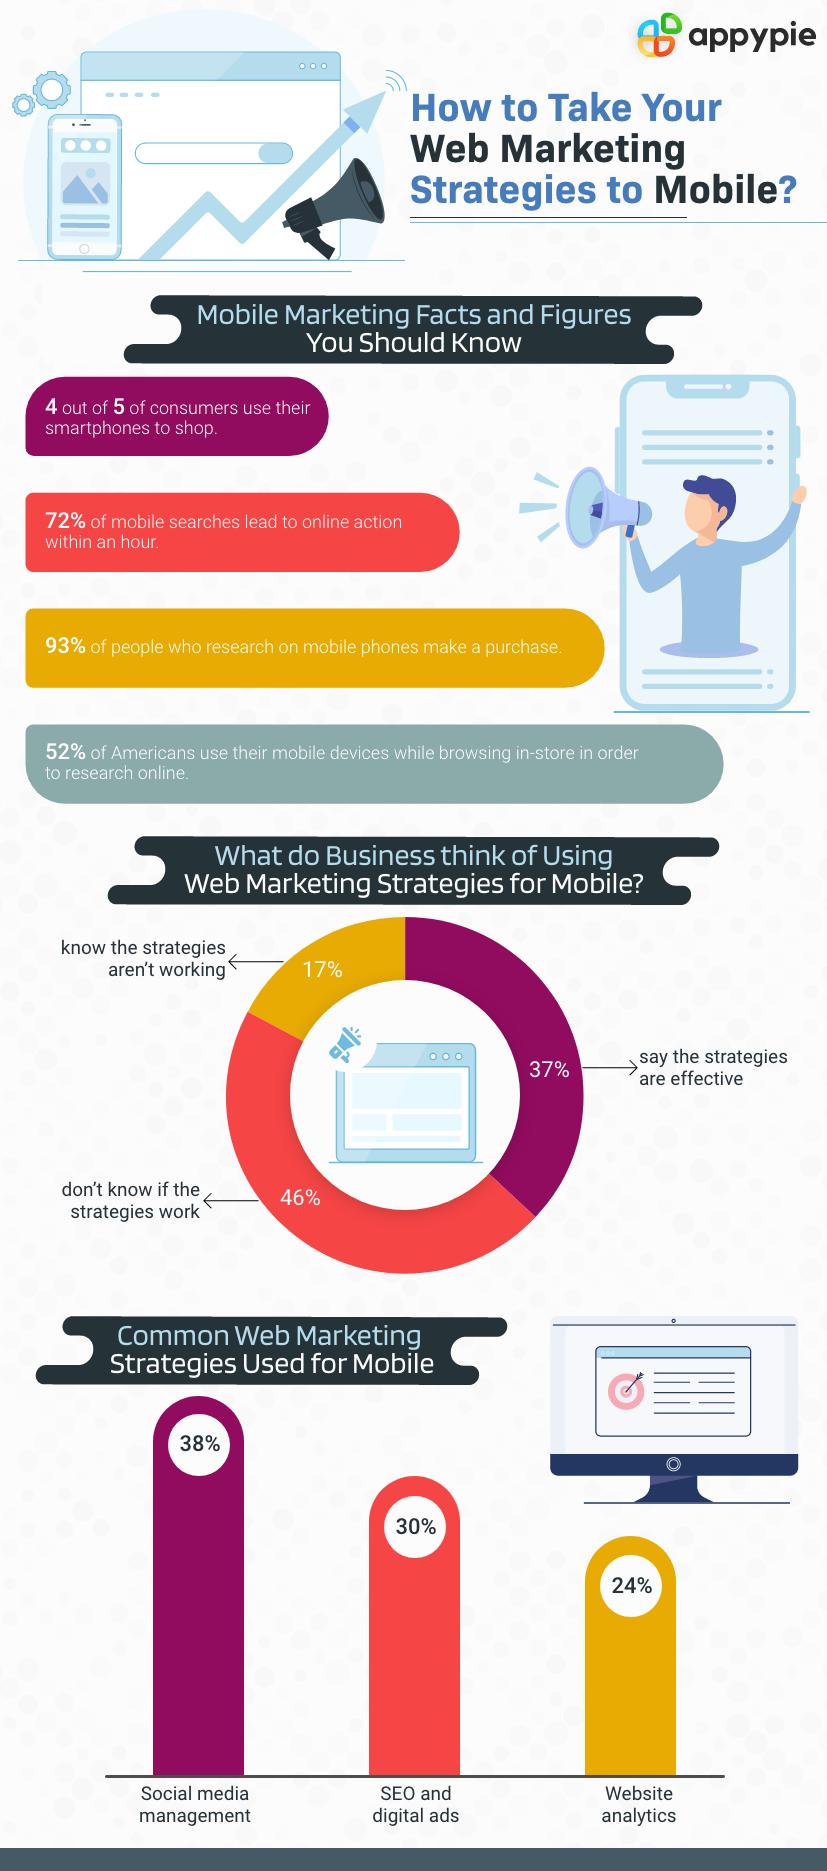 Web Marketing Strategies to Mobile - Appy Pie